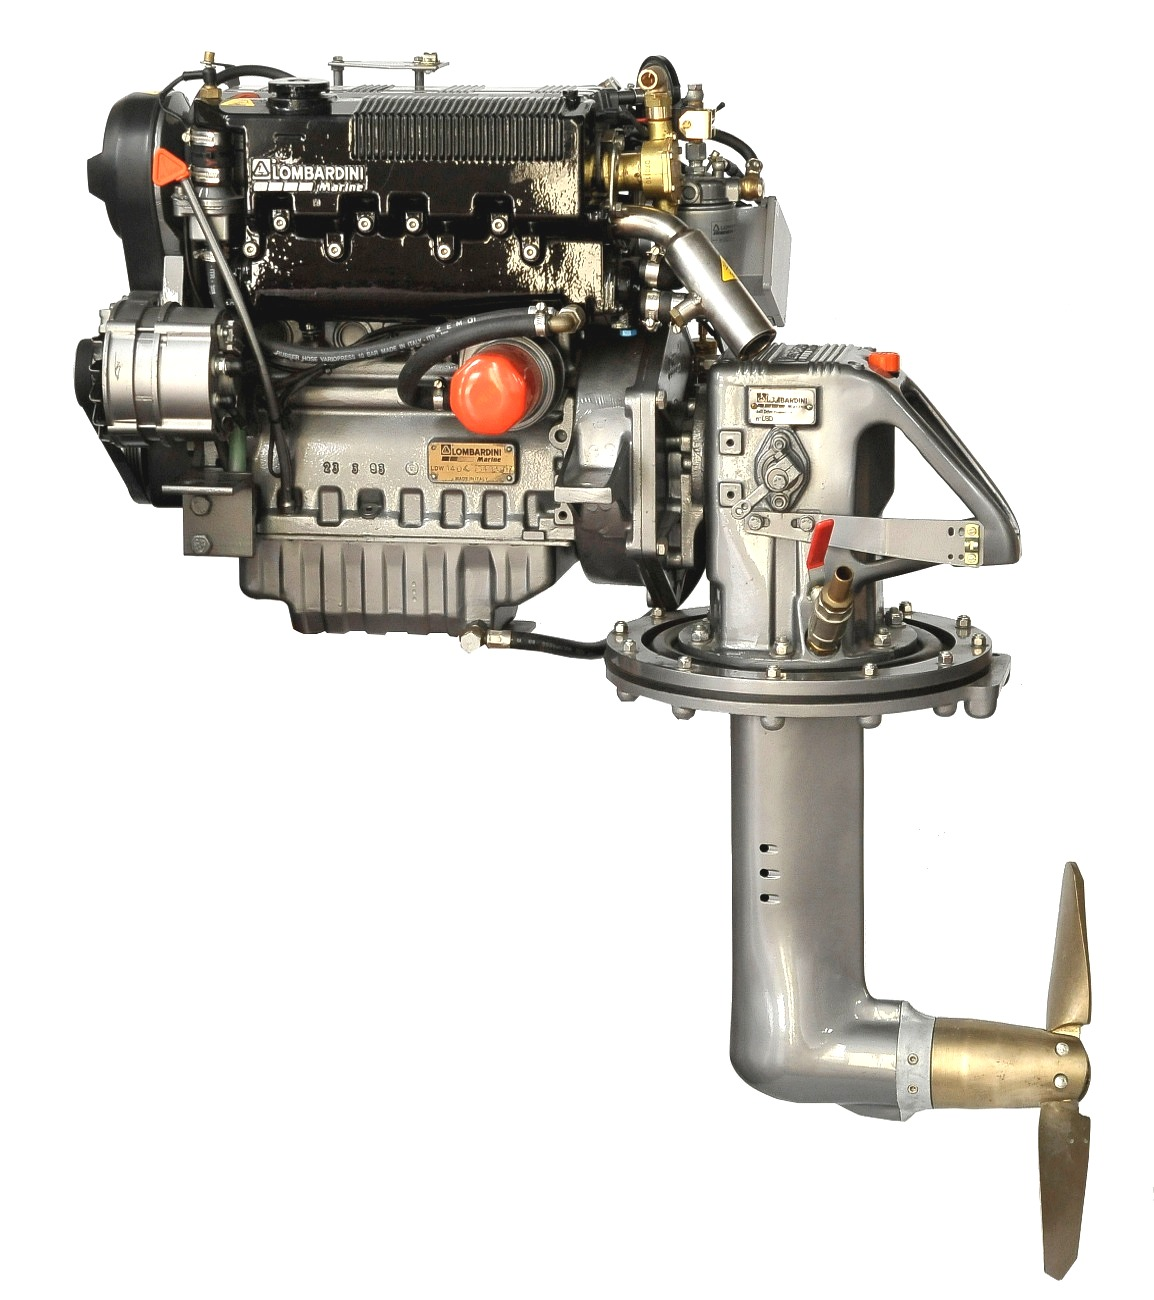 Lombardini LDW1404M, 35 hk dieselmotor med S-drev